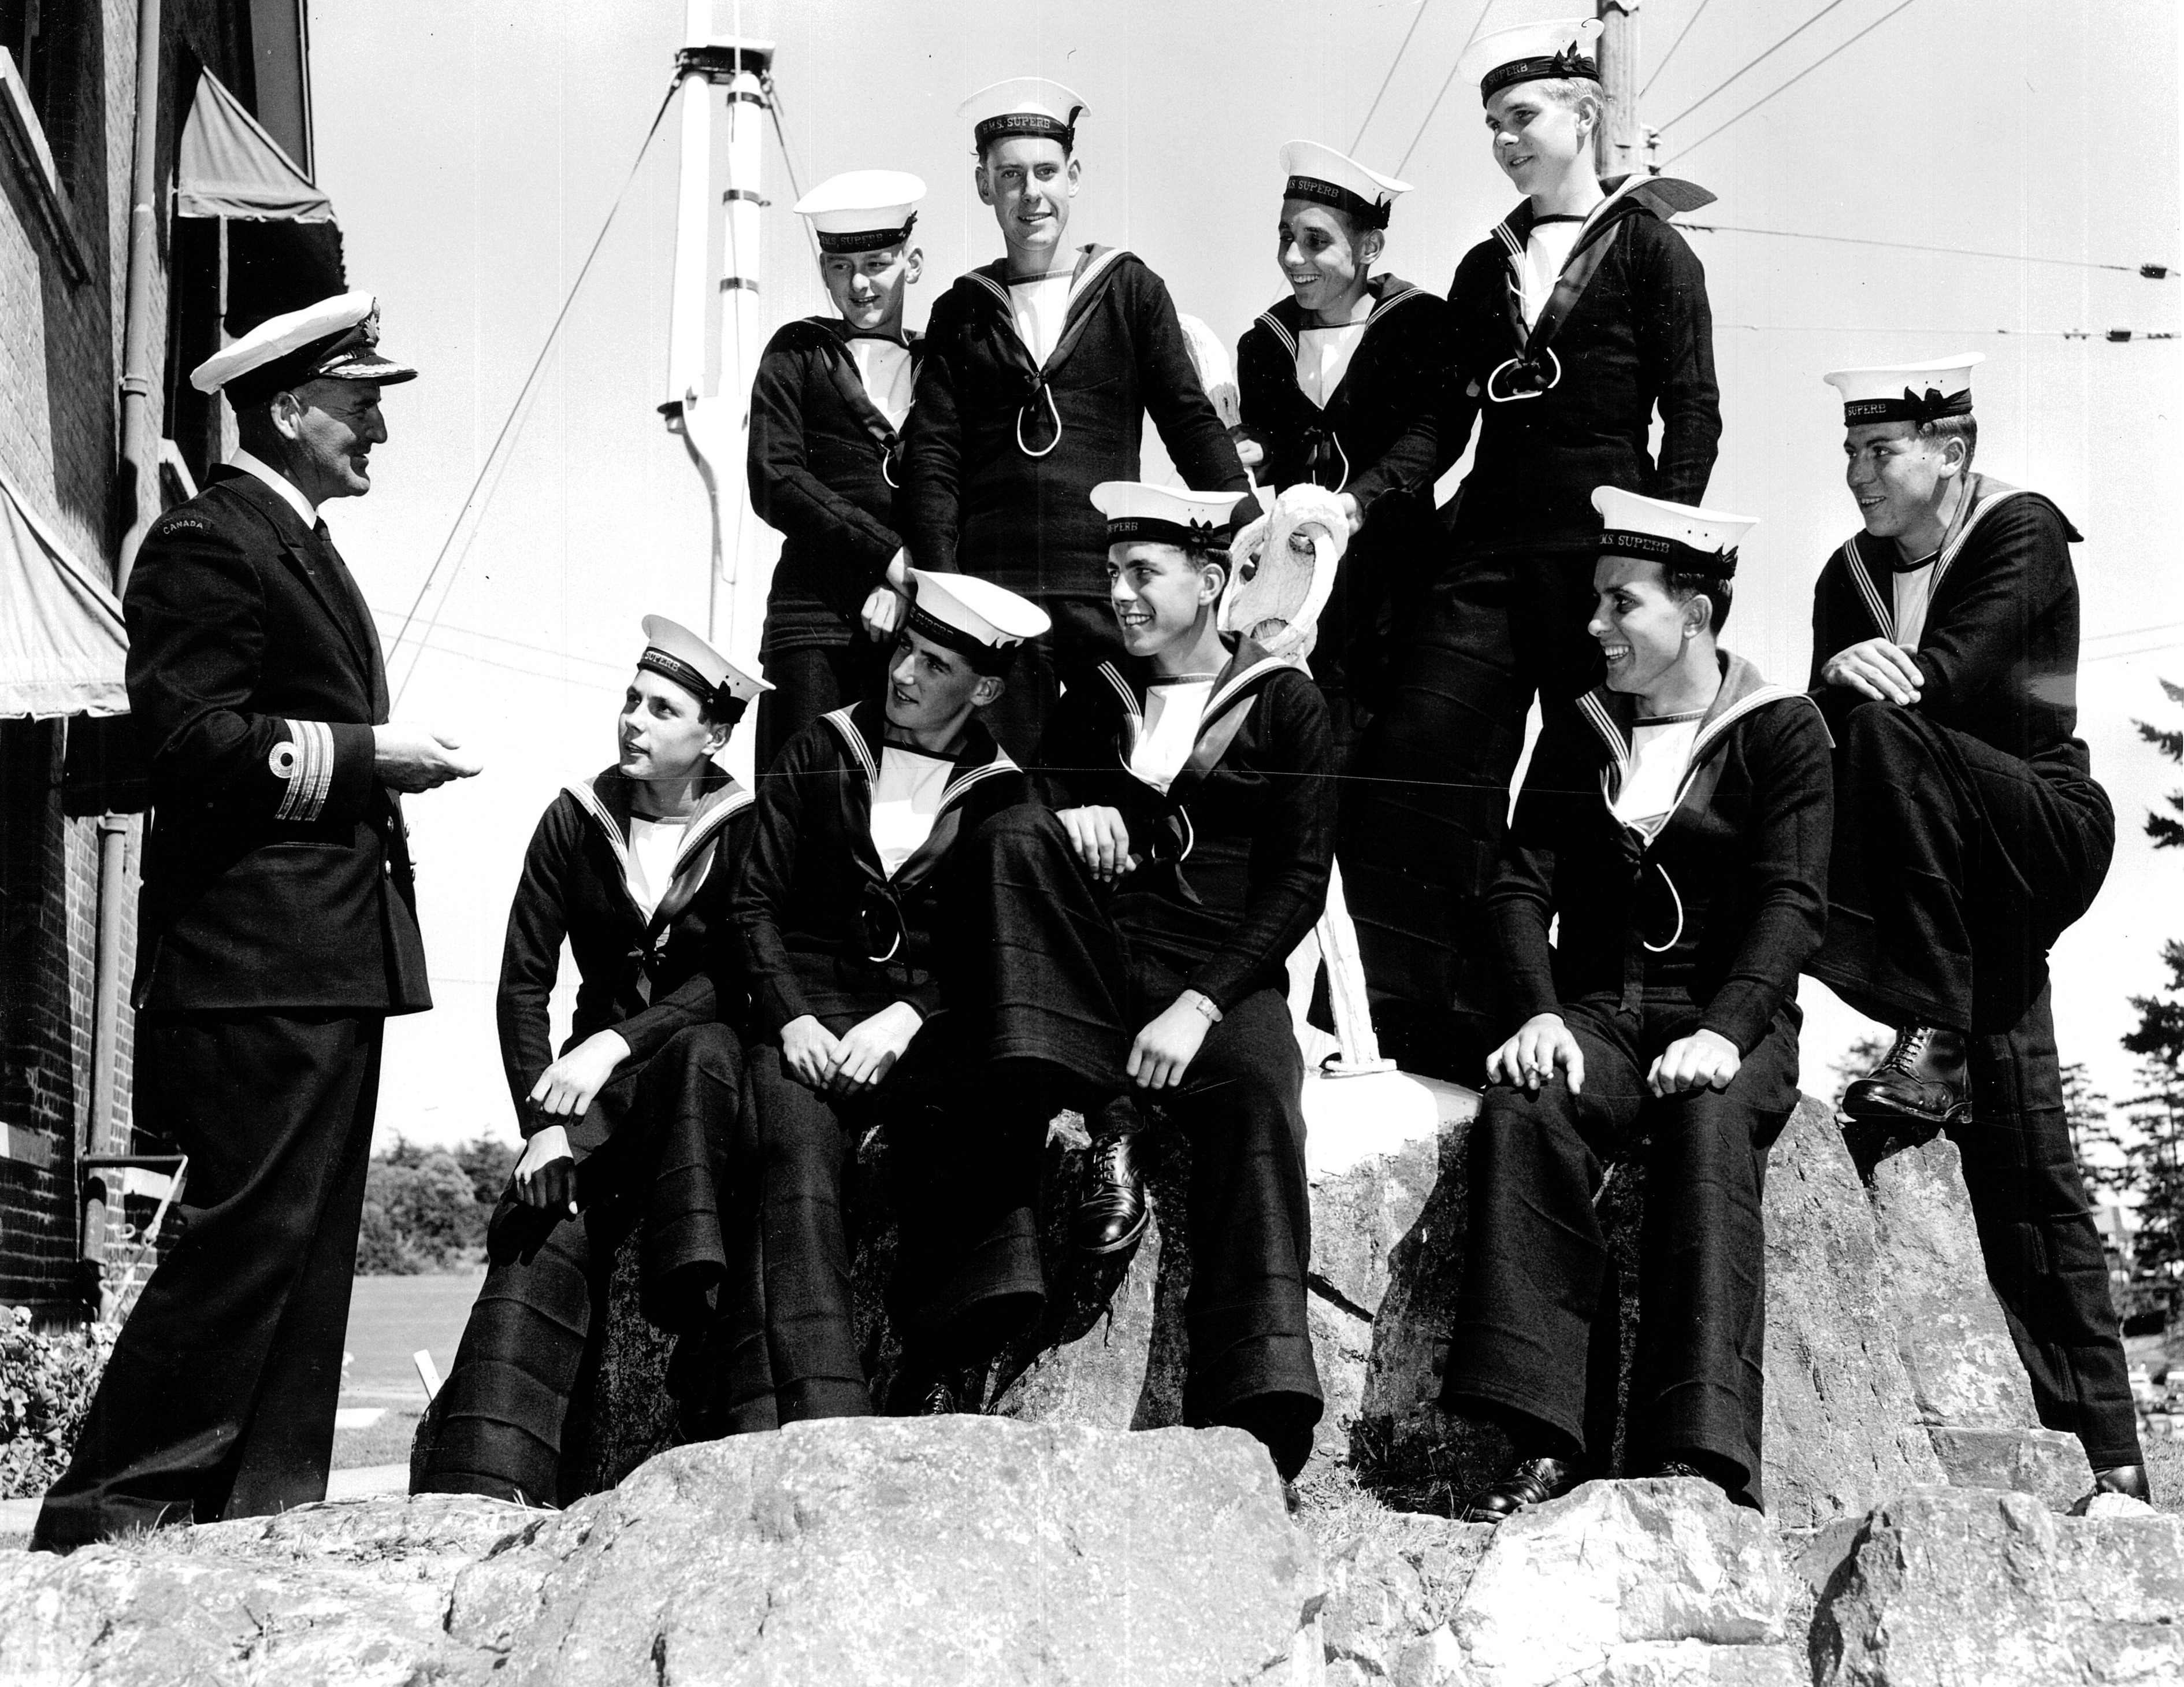 Maritime Museum of BC - Sailors